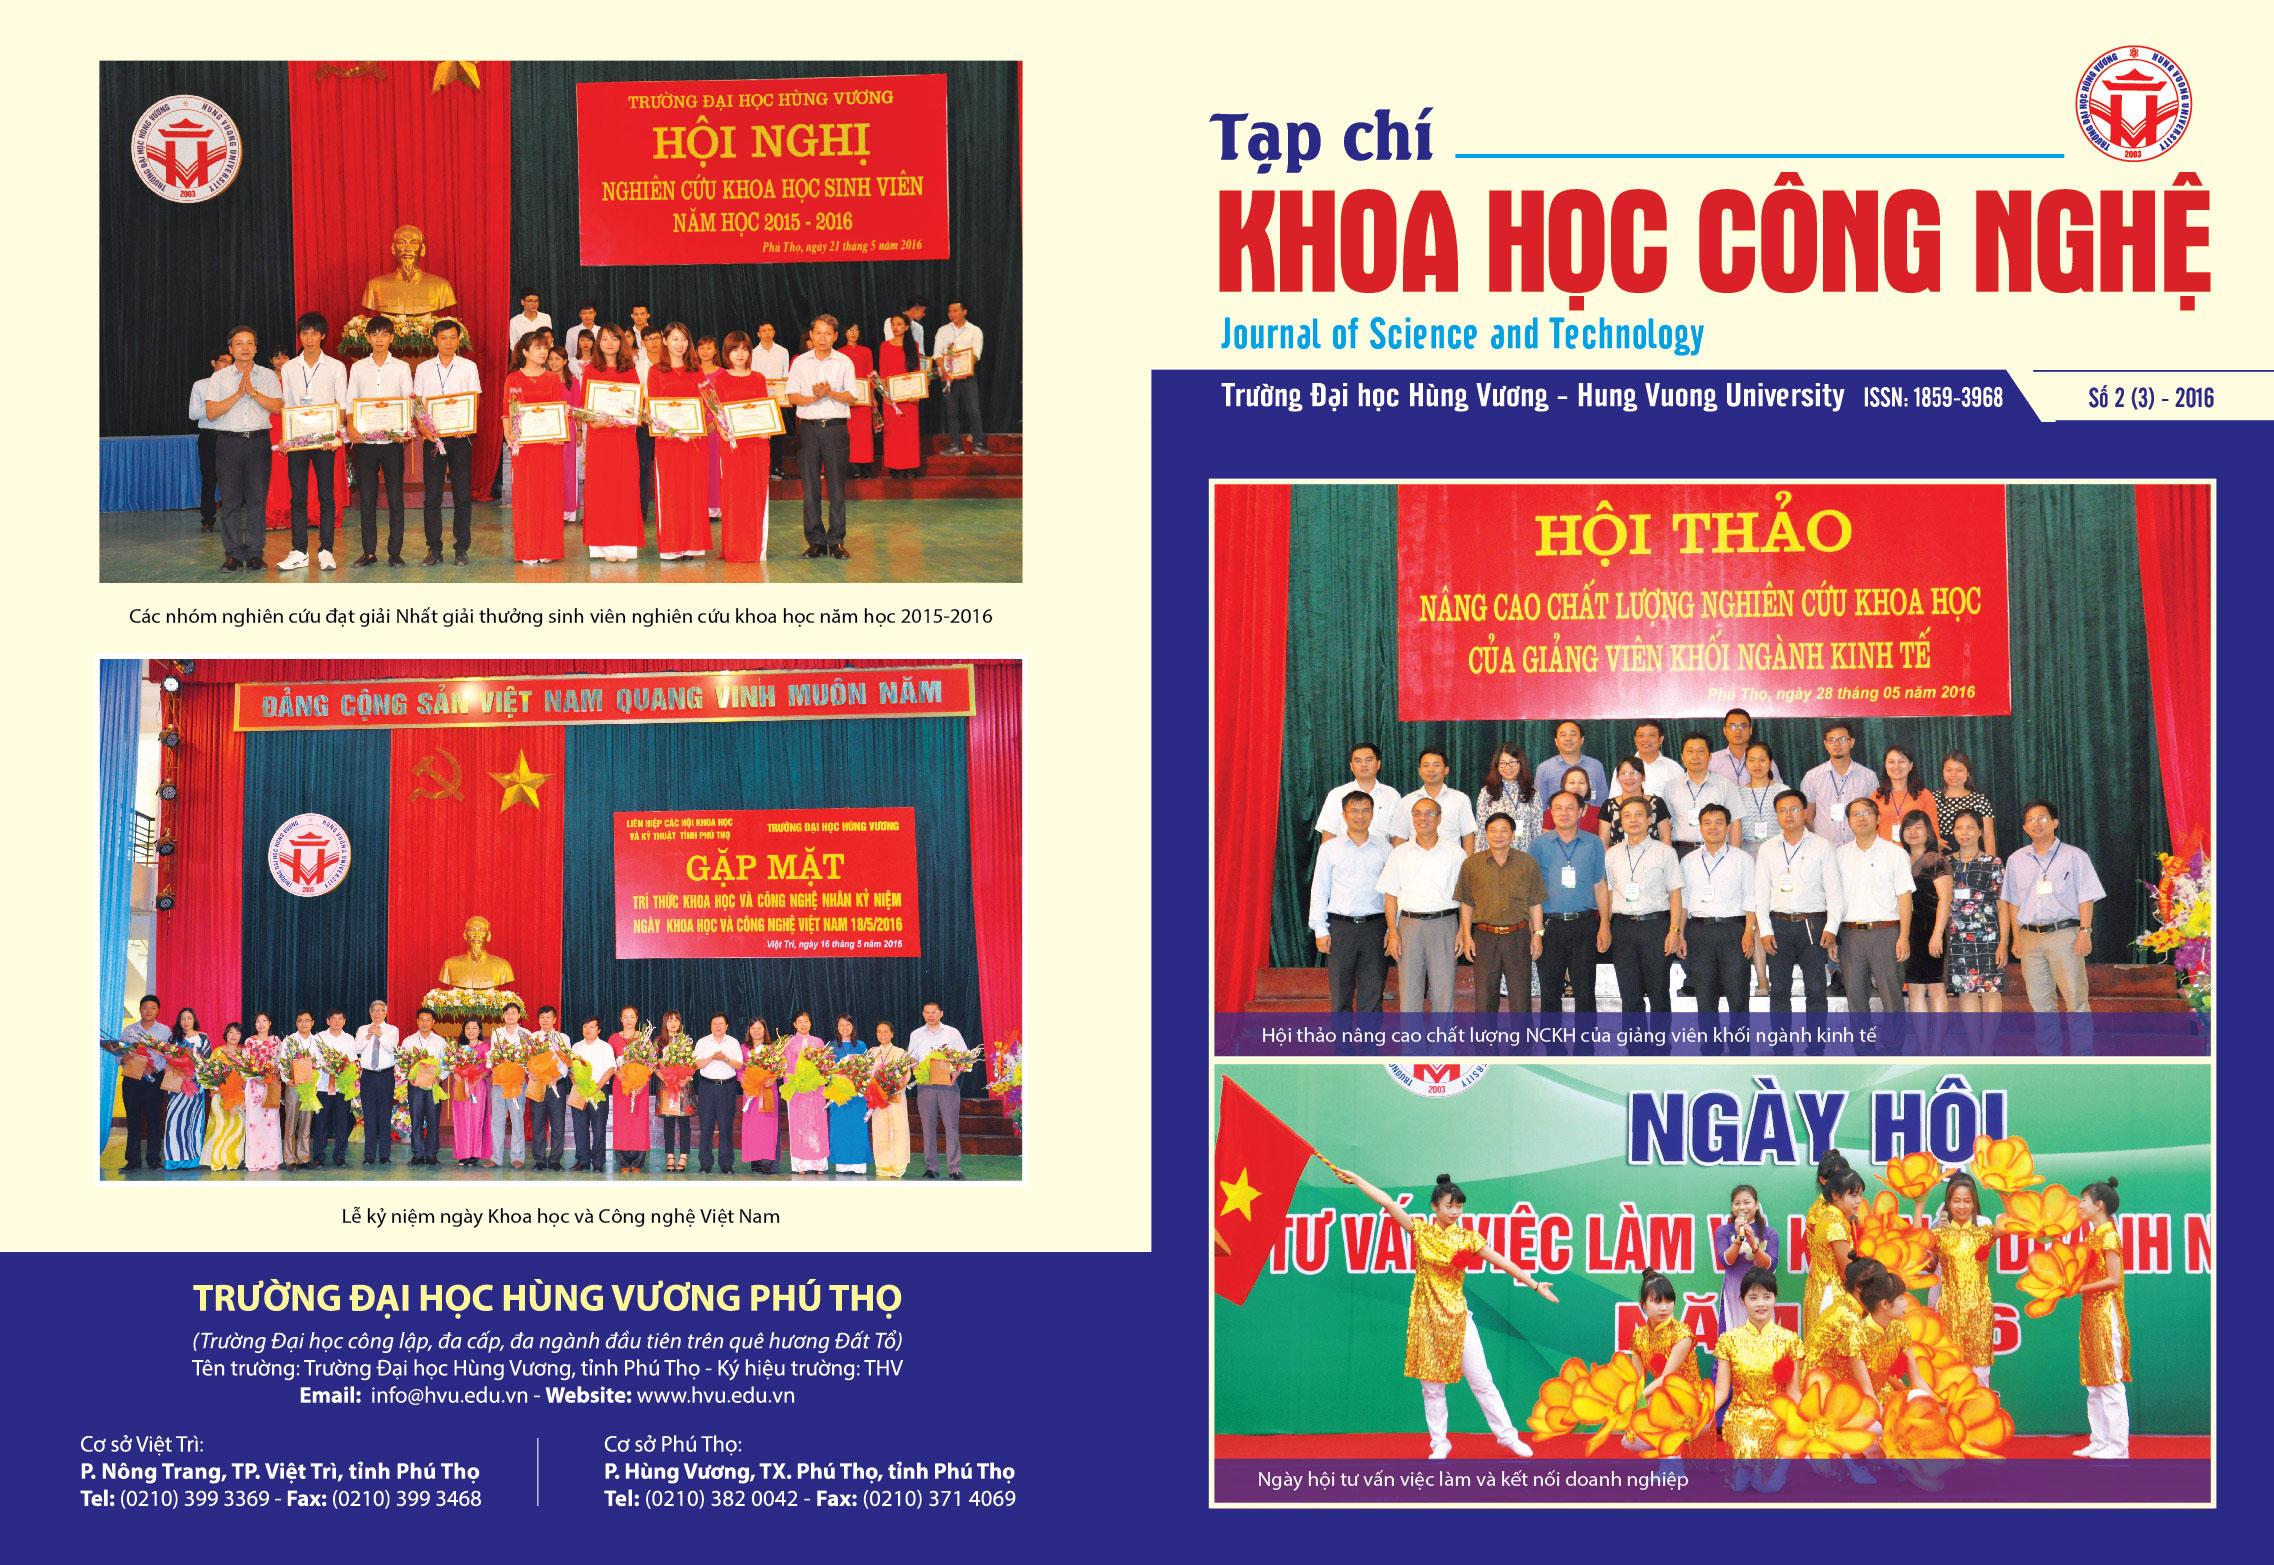 Tap chi Khoa hoc Cong nghe so 3 - 2016